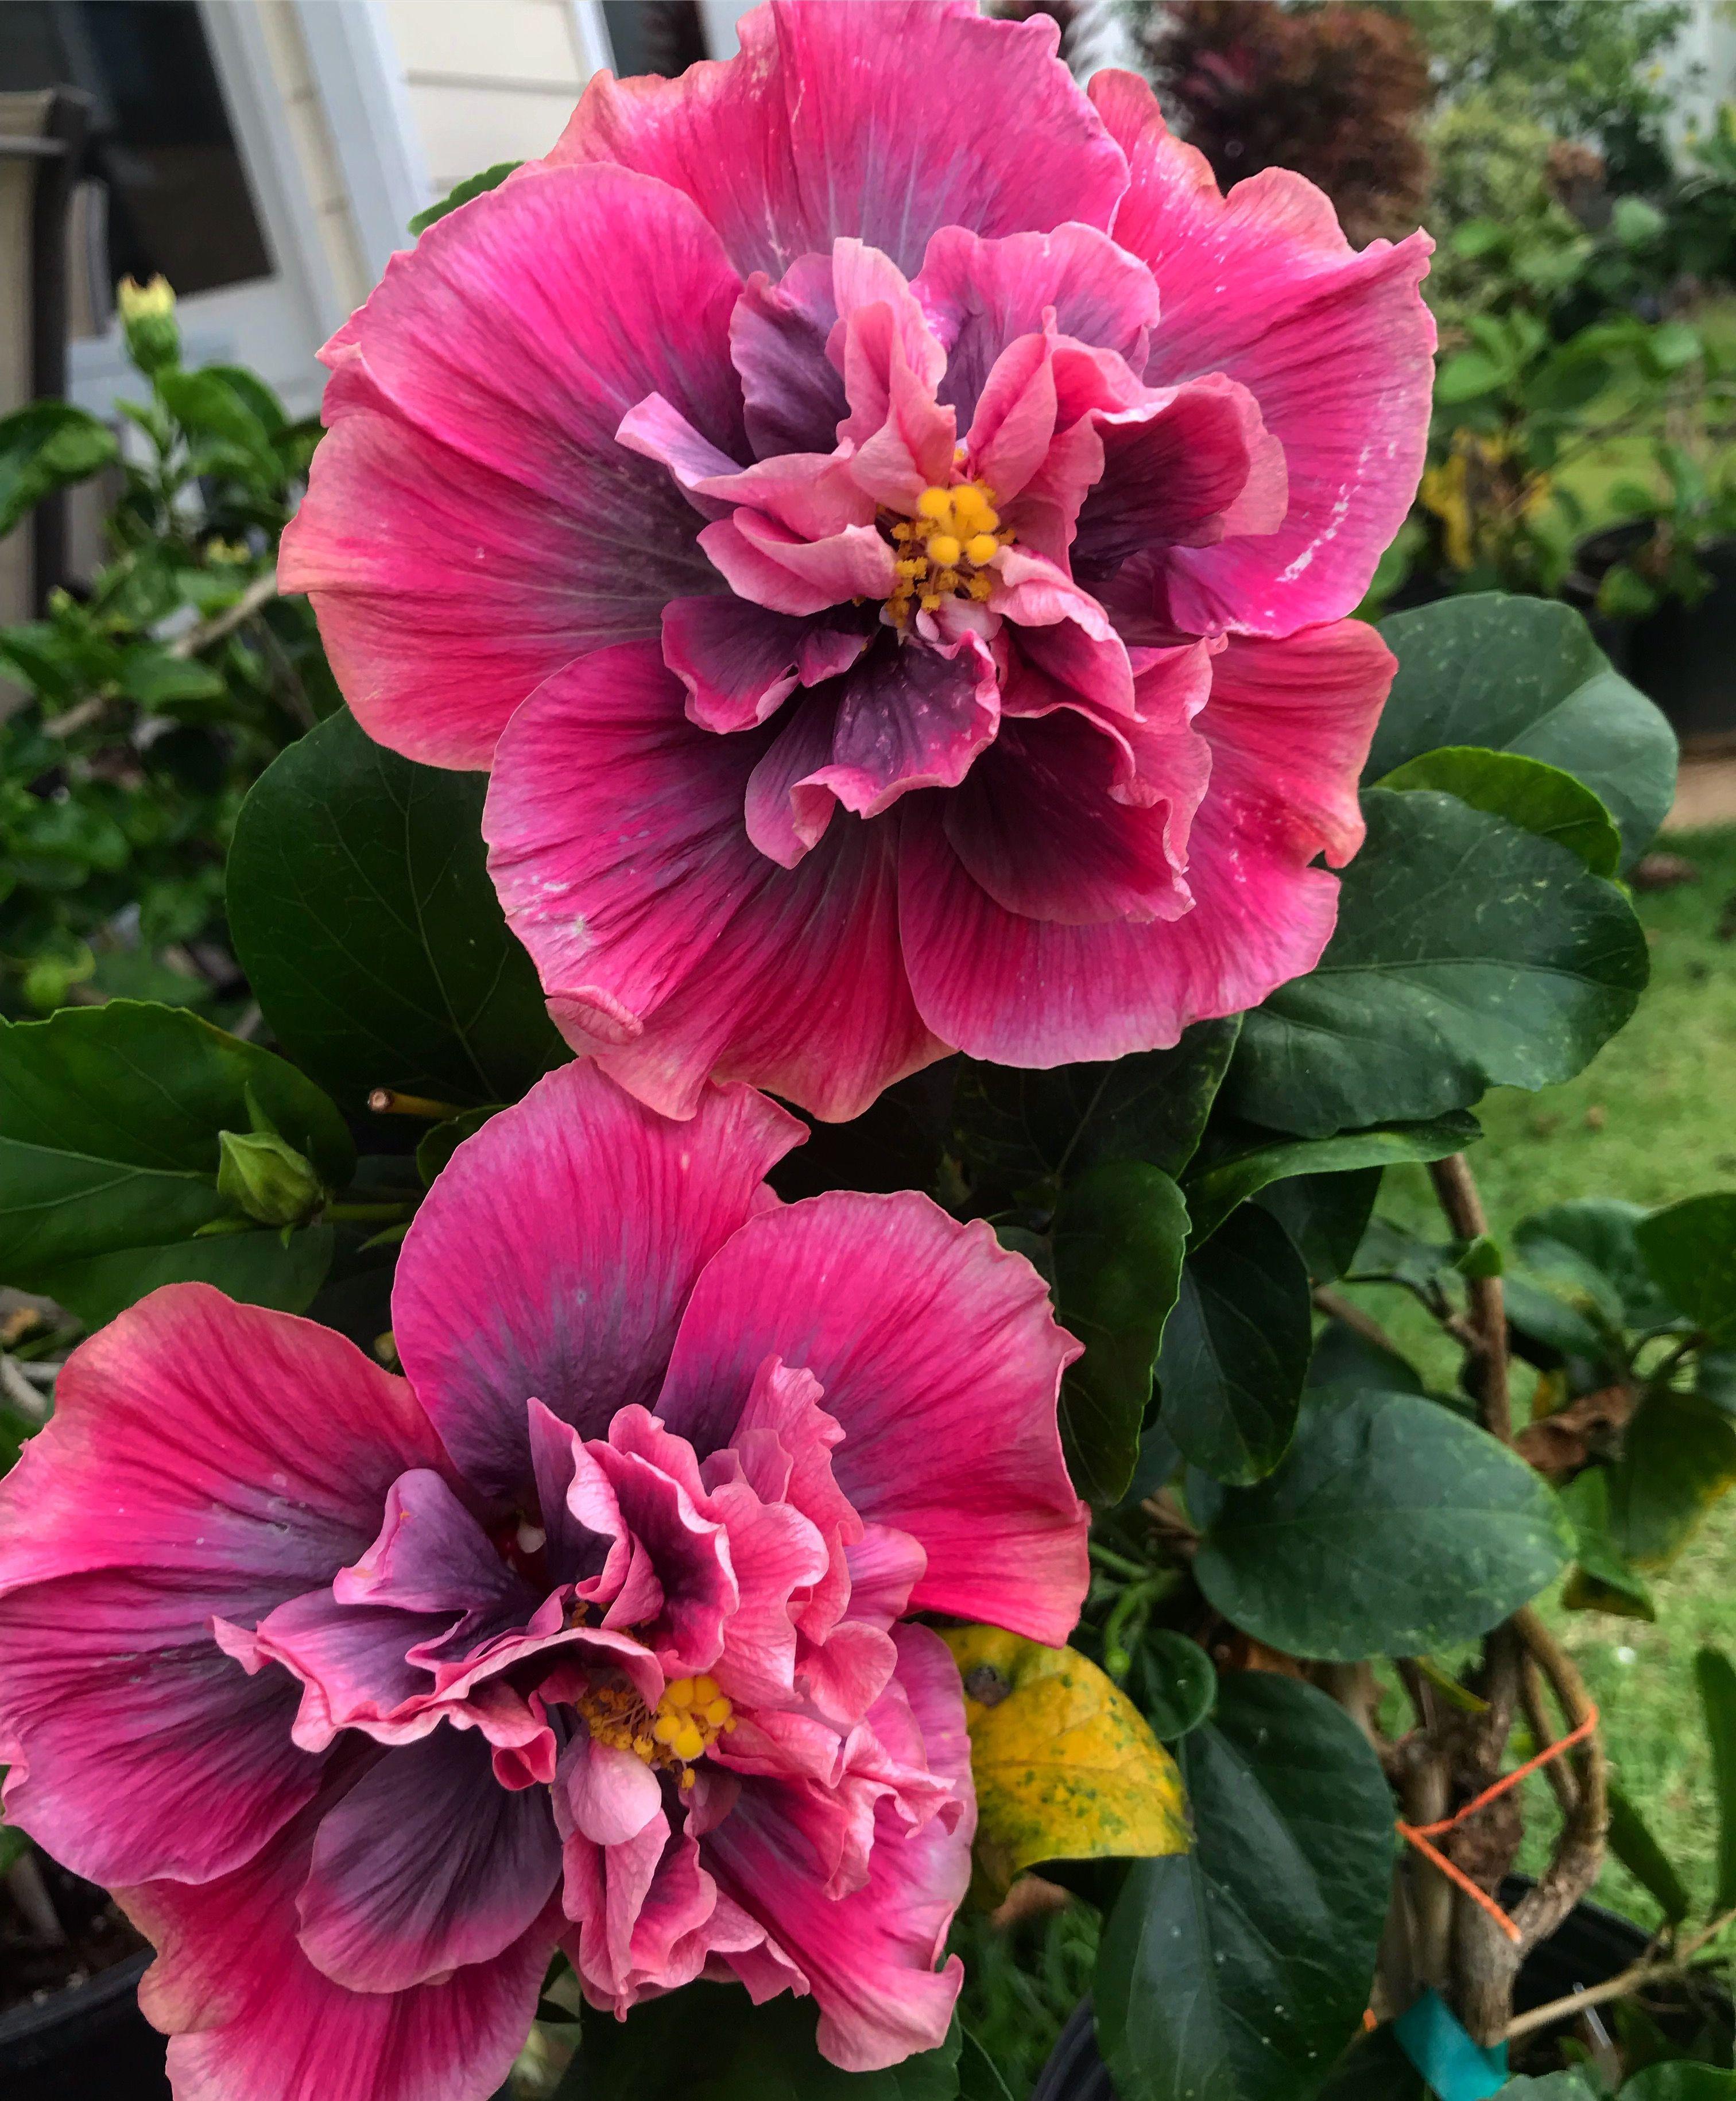 Hibiscus - Simple English Wikipedia, the free encyclopedia